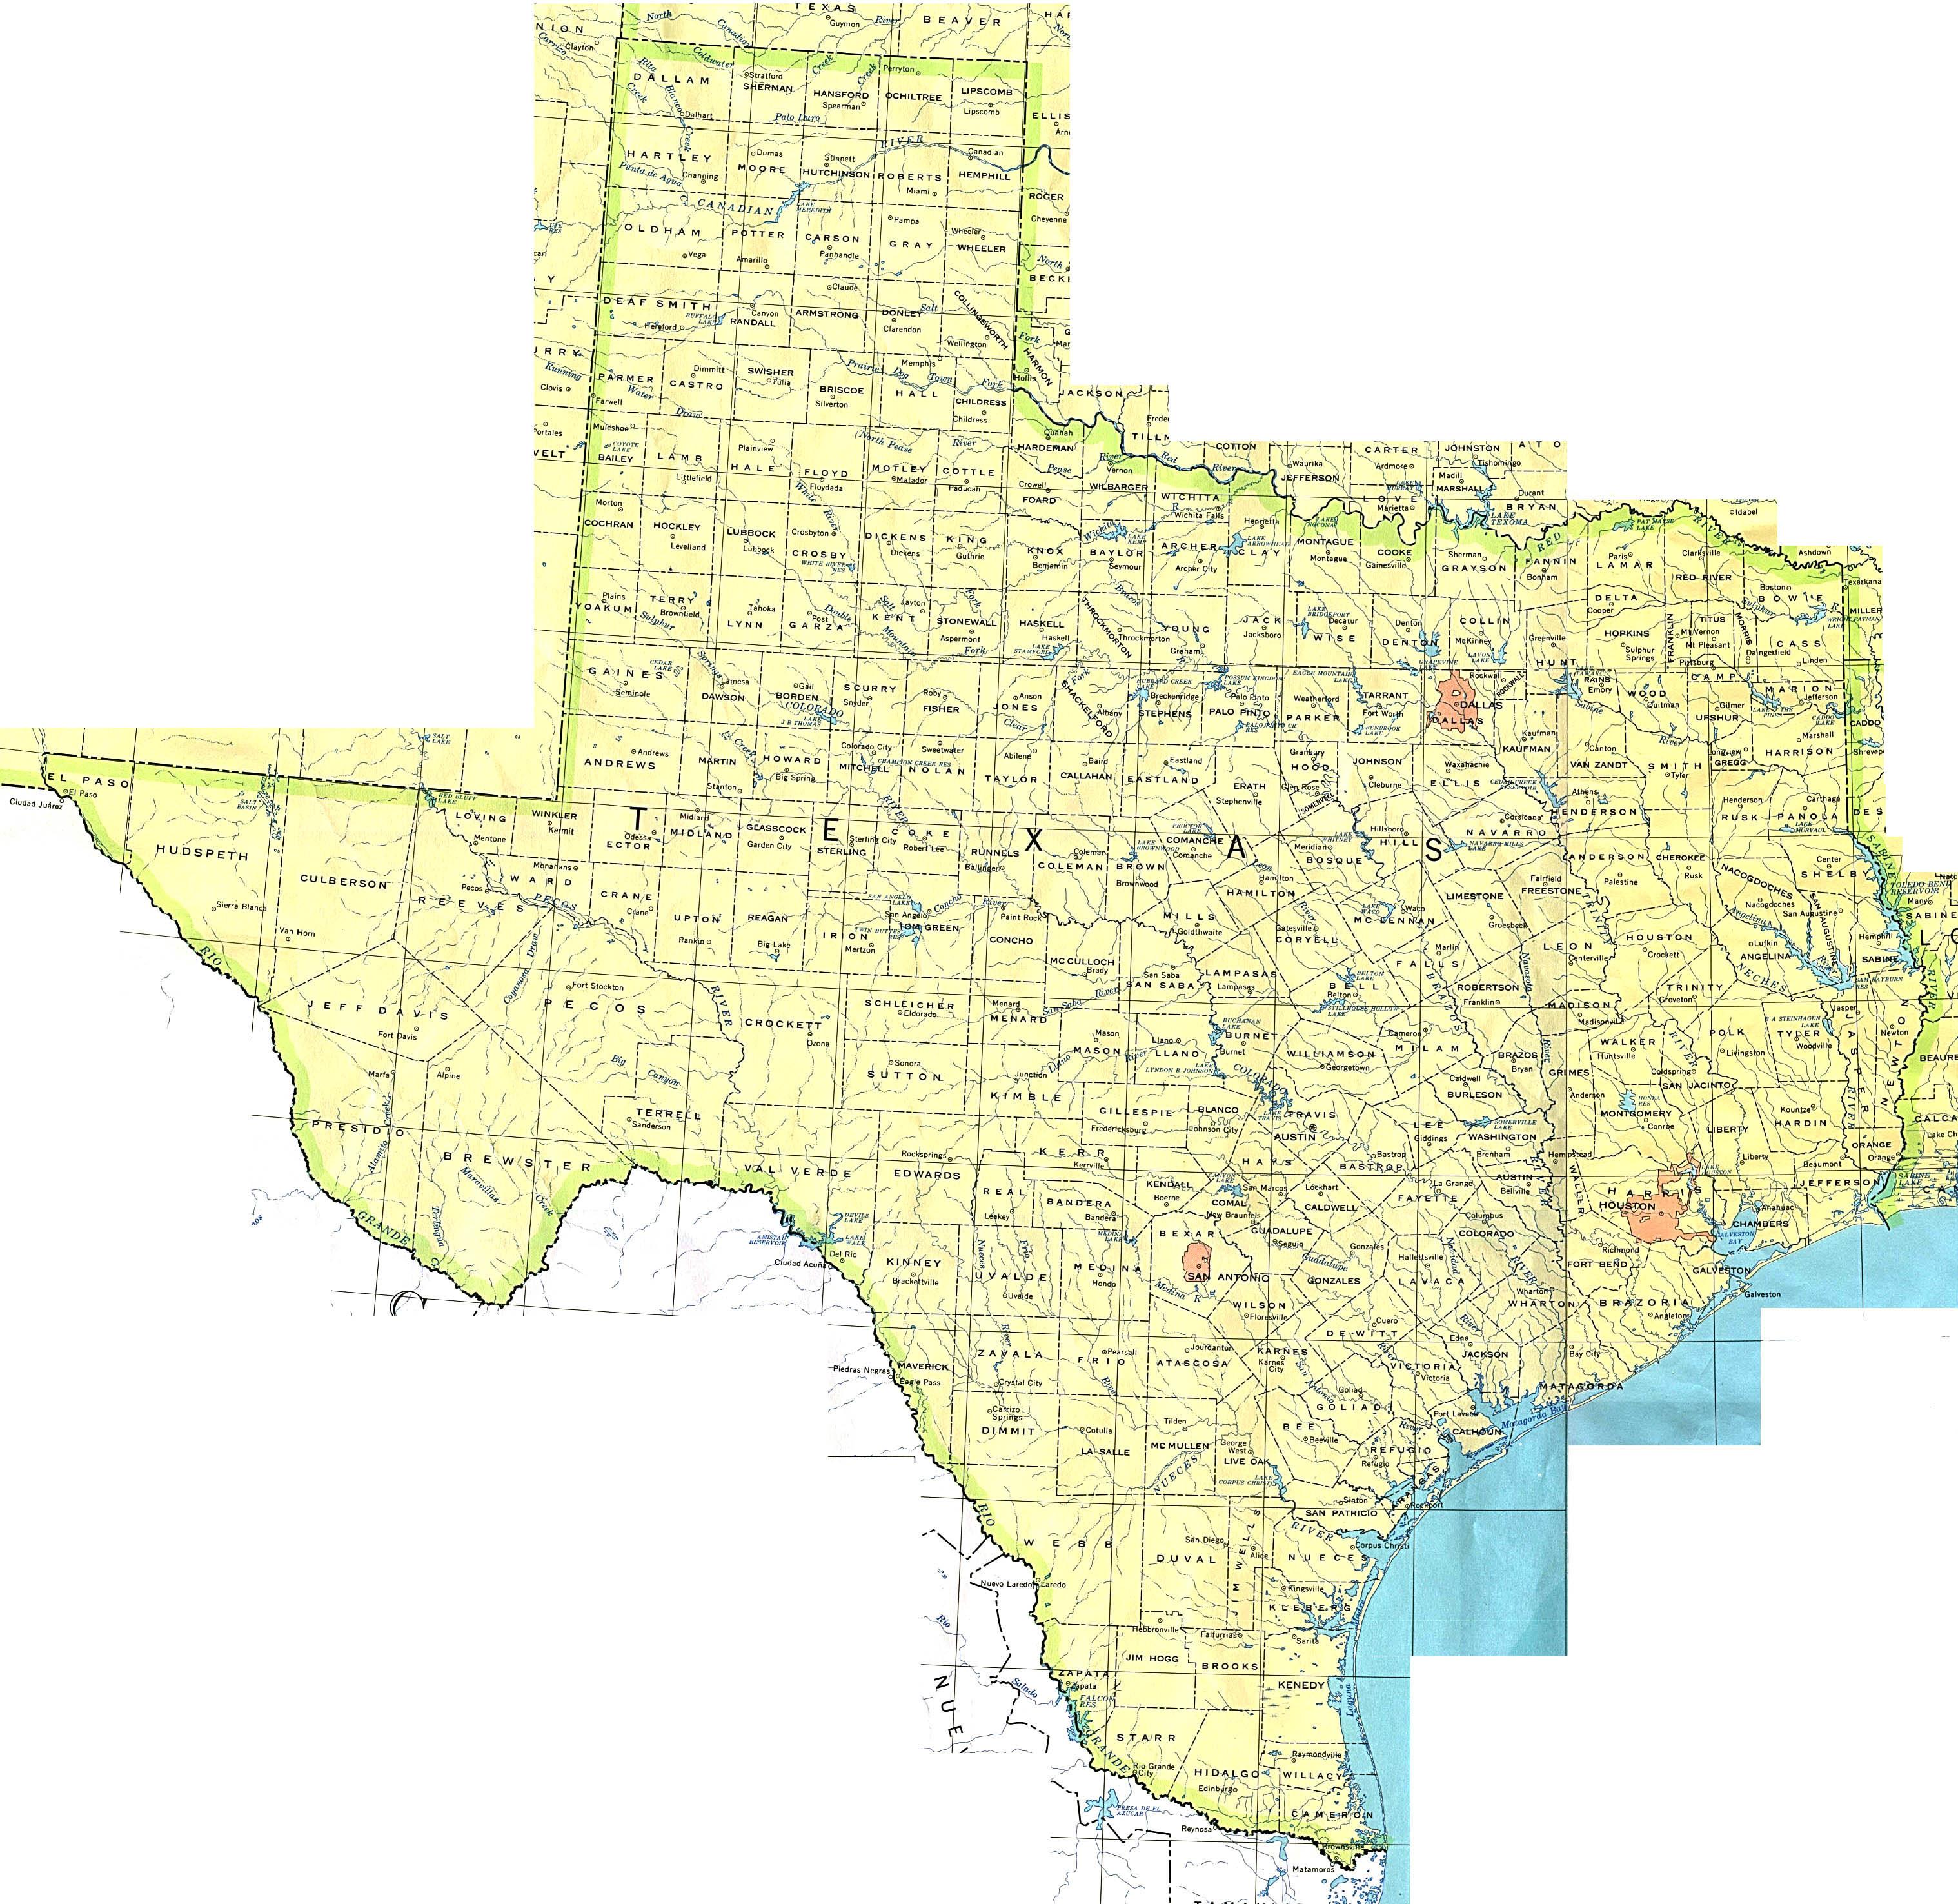 Texas Maps - Perry-Castañeda Map Collection - Ut Library Online - Texas Survey Maps